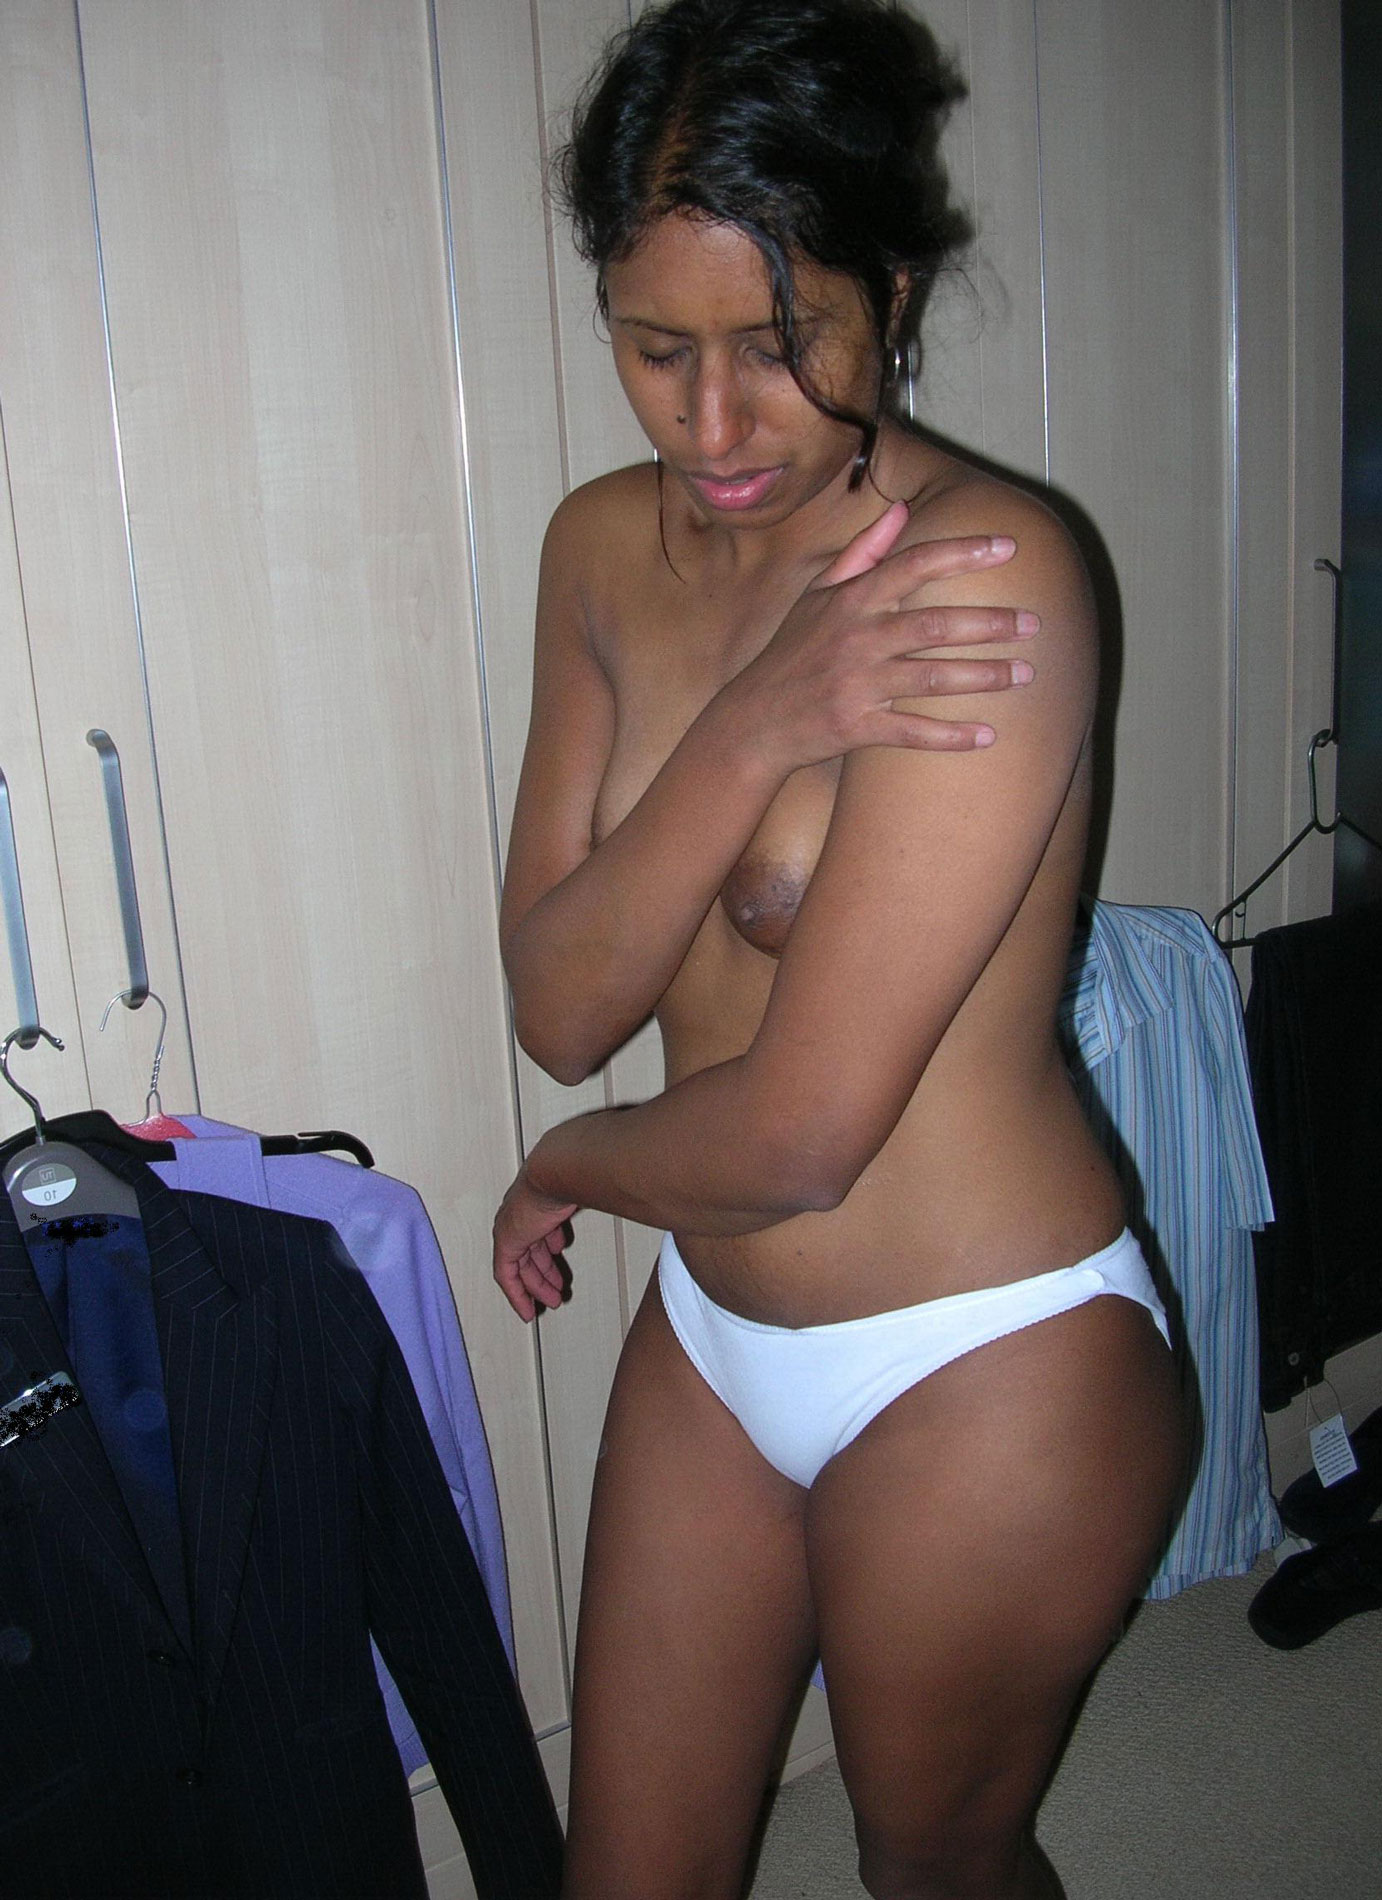 Celeb India Love Nude Photos Pics